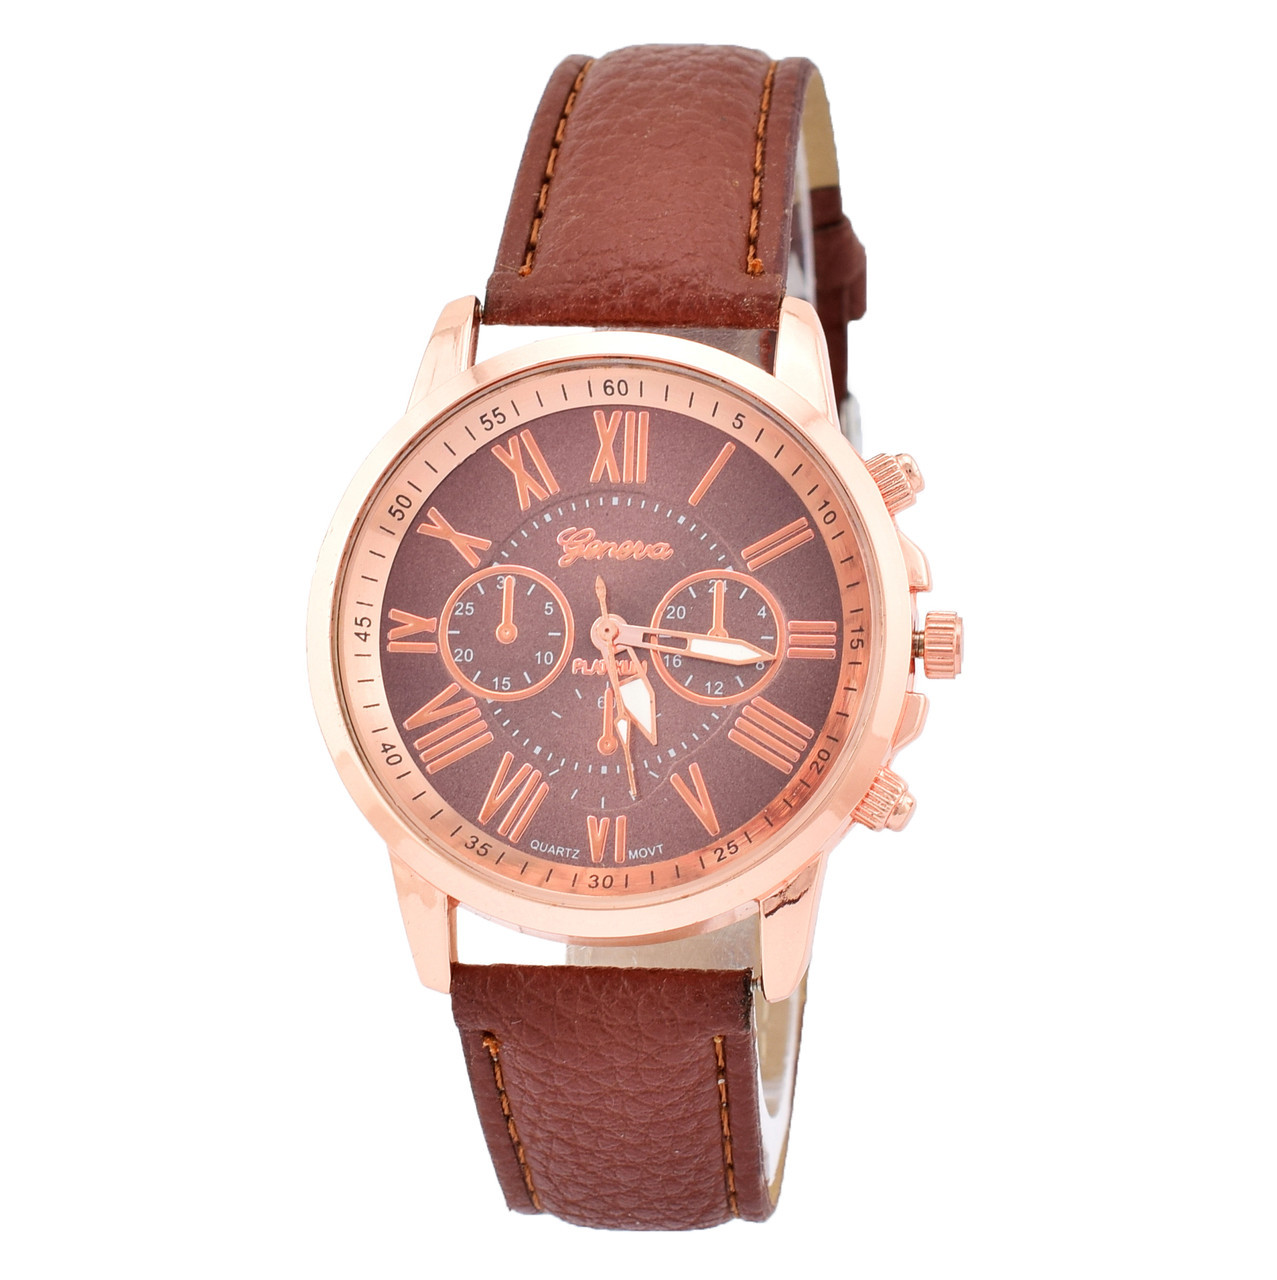 Часы G-012 диаметр циферблата 4 см, длина ремешка 17-21 см, коричневый цвет, позолота РО